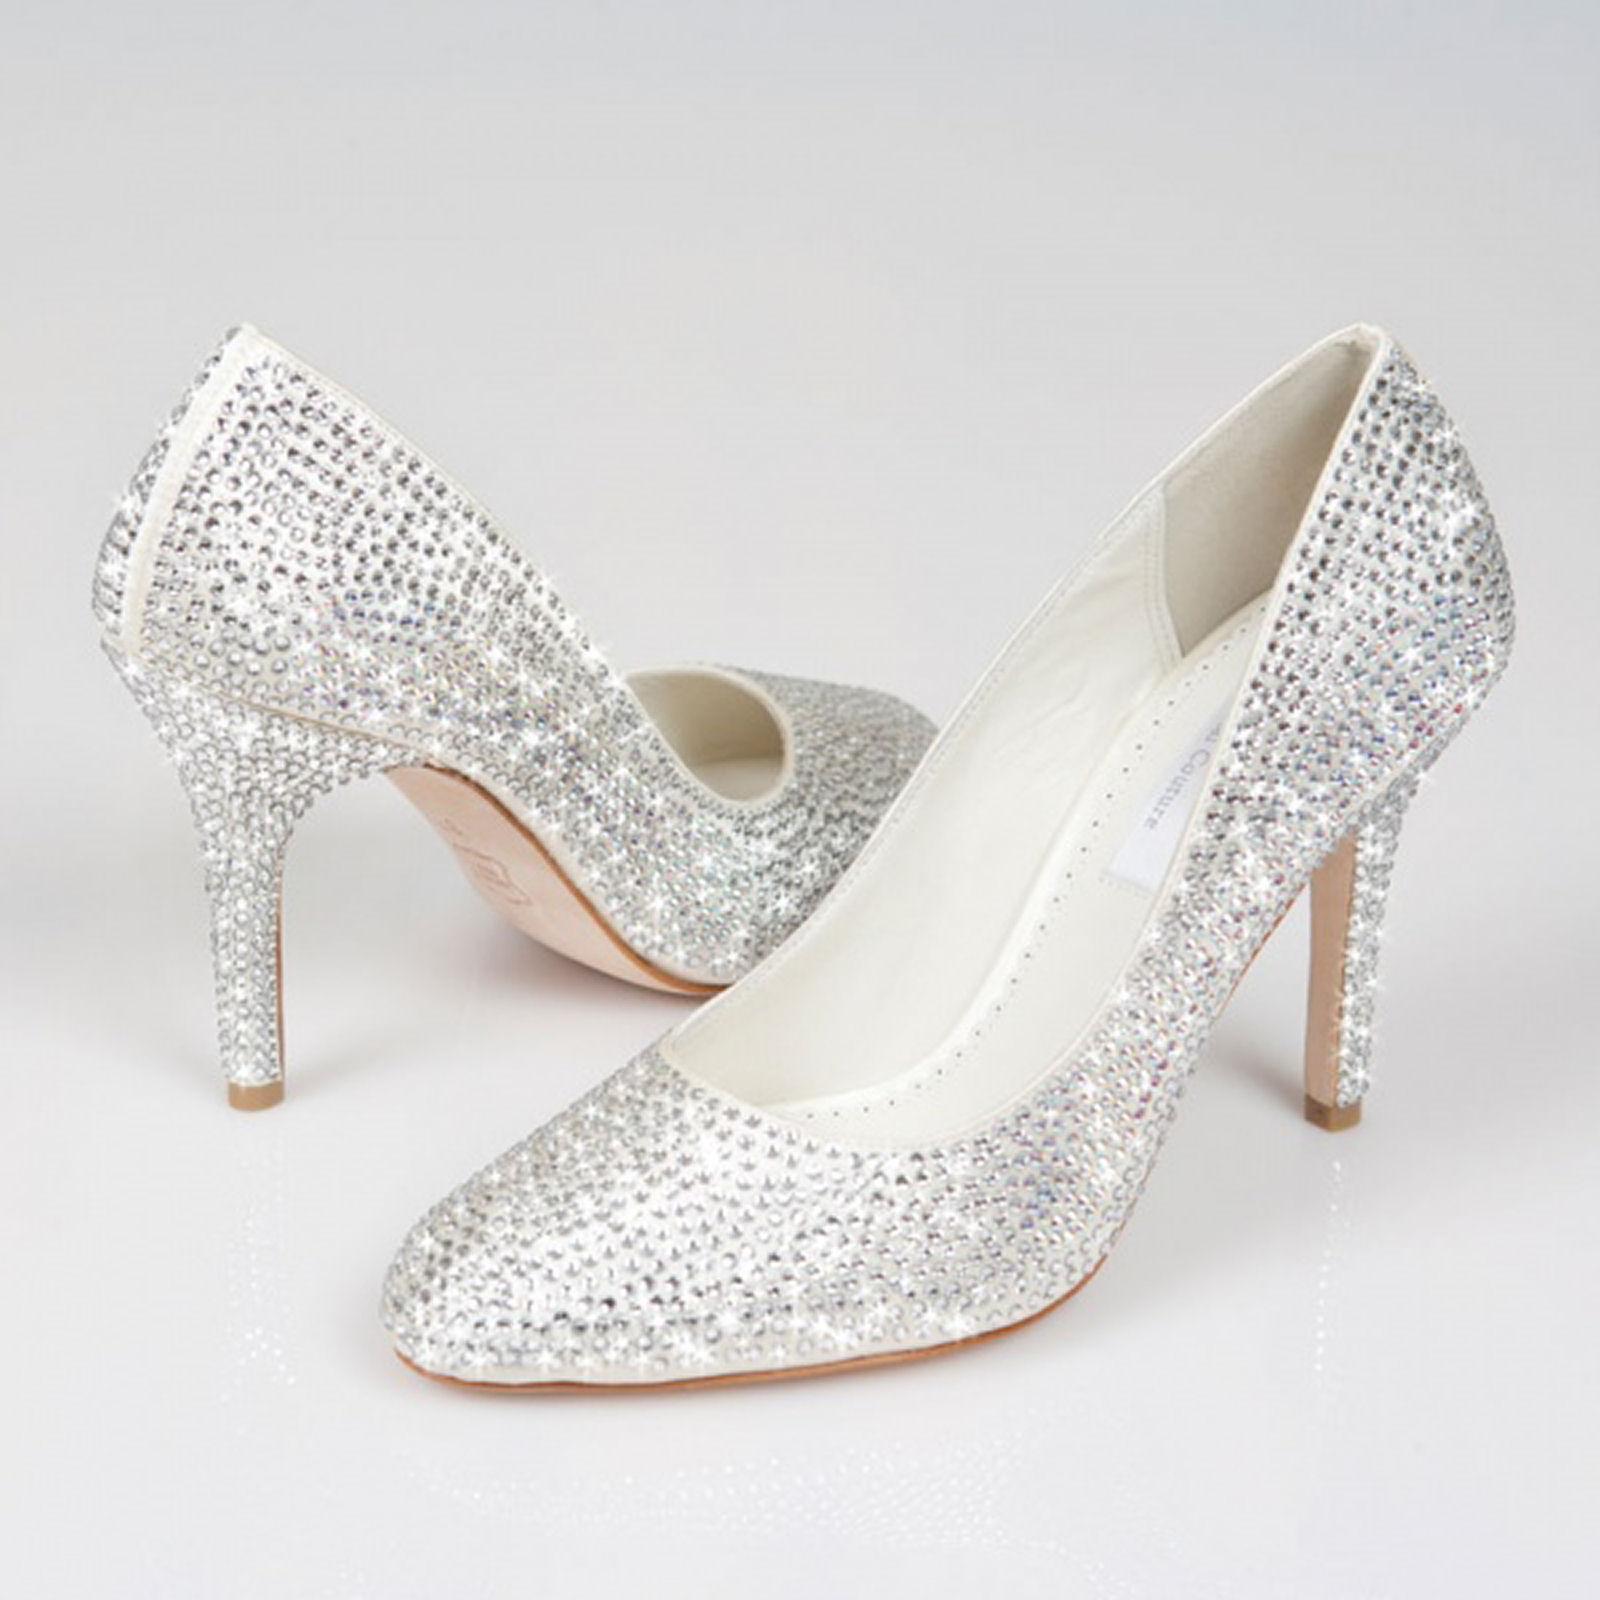 silver flat wedding shoes photo - 1